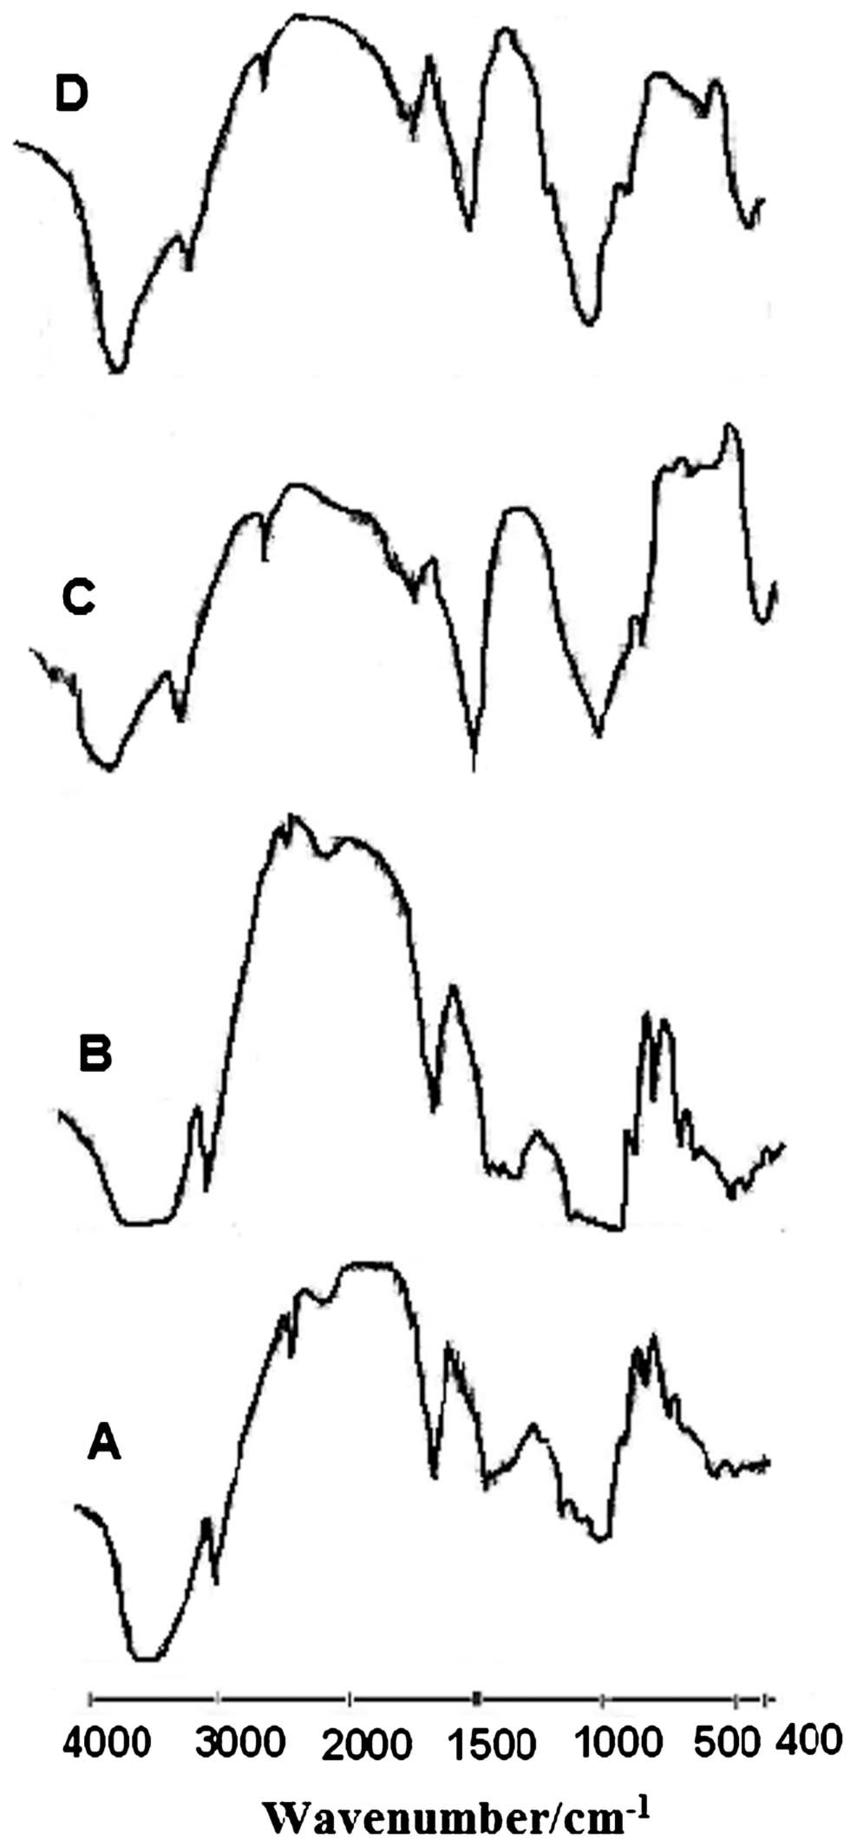 FTIR spectra of amylose (A), amylopectin (B), and their